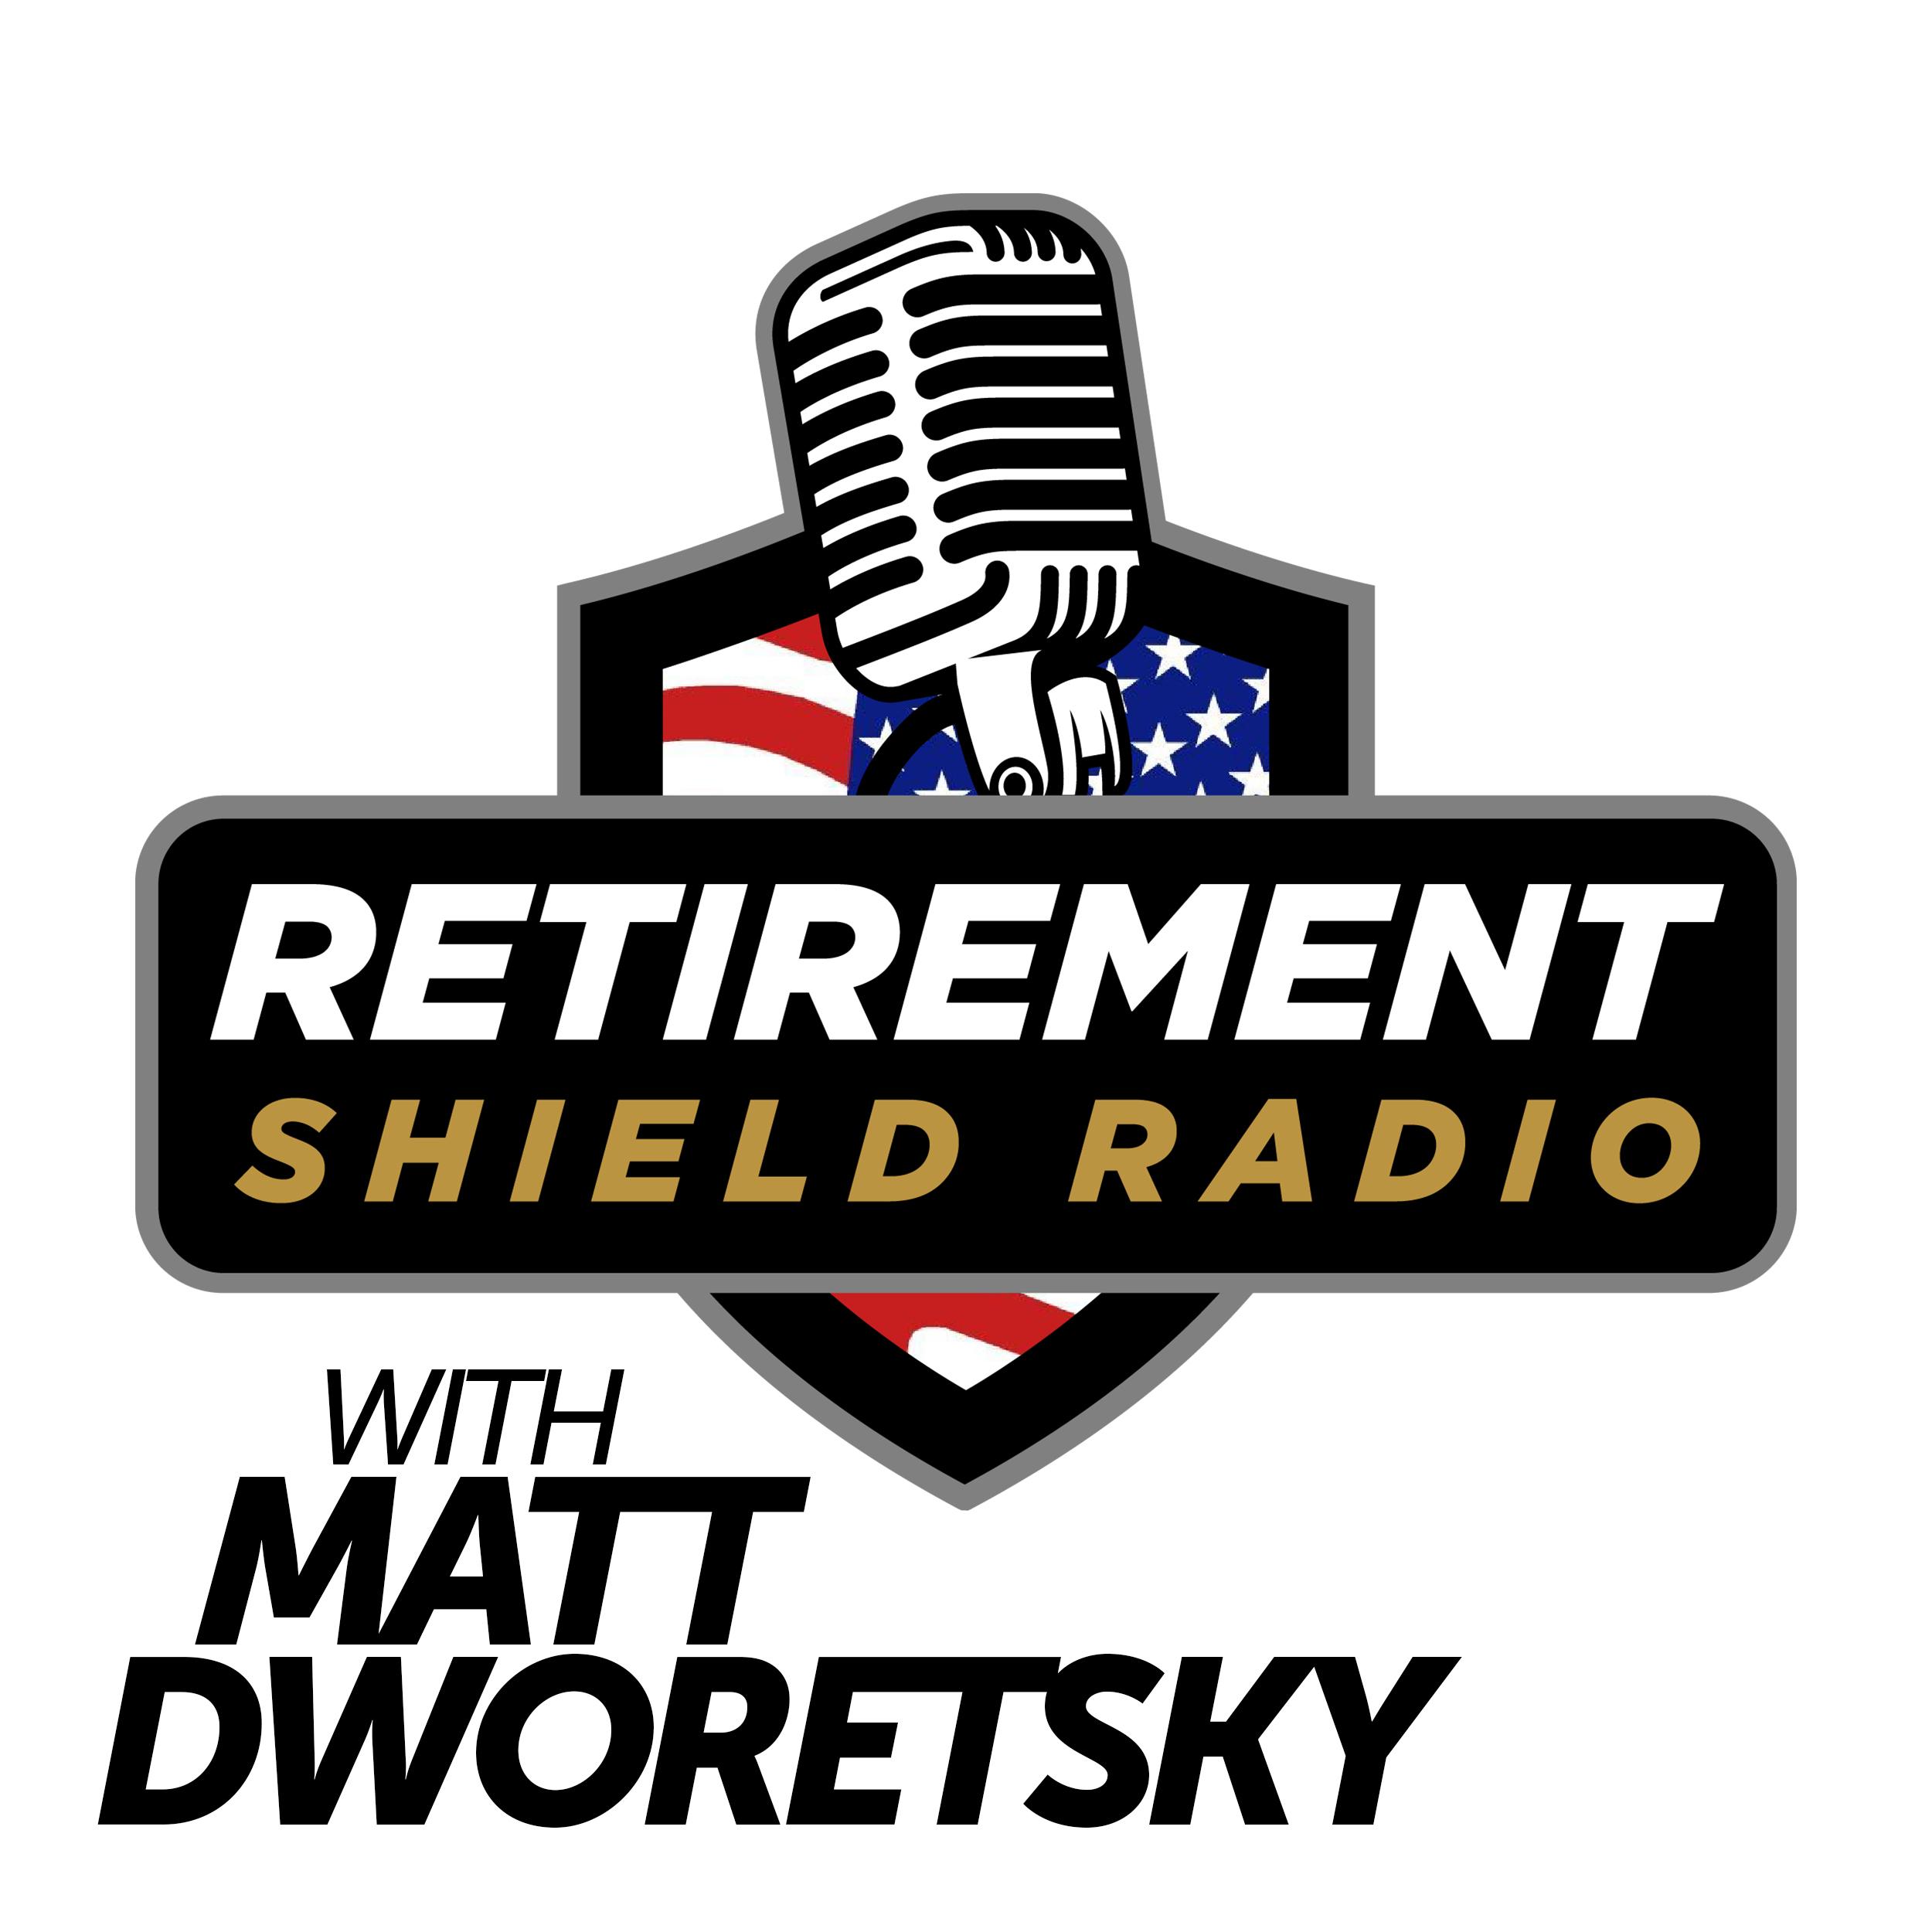 Retirement Shield Radio with Matt Dworetsky